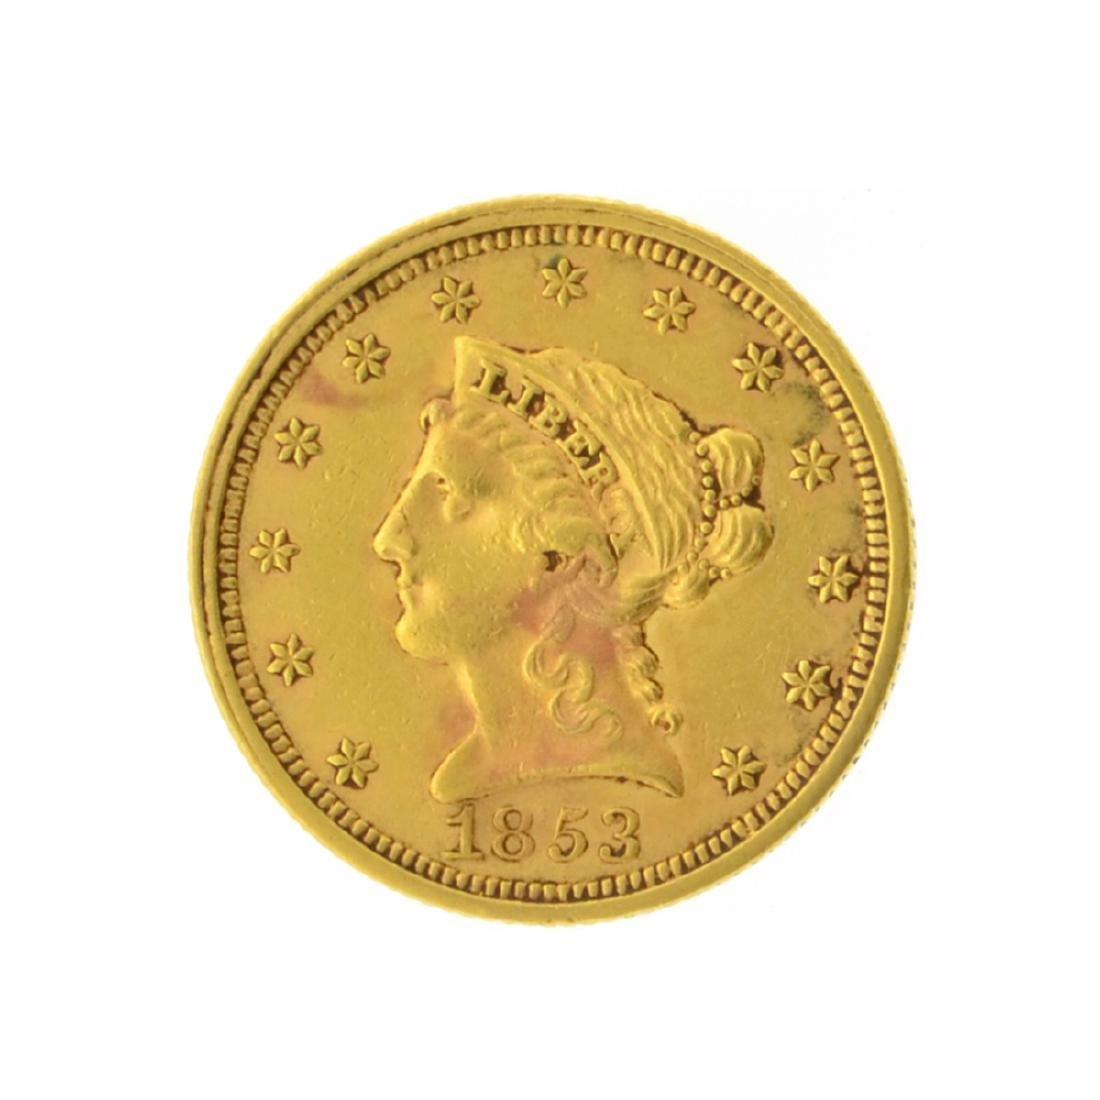 1853 $2.50 Liberty Head Gold Coin